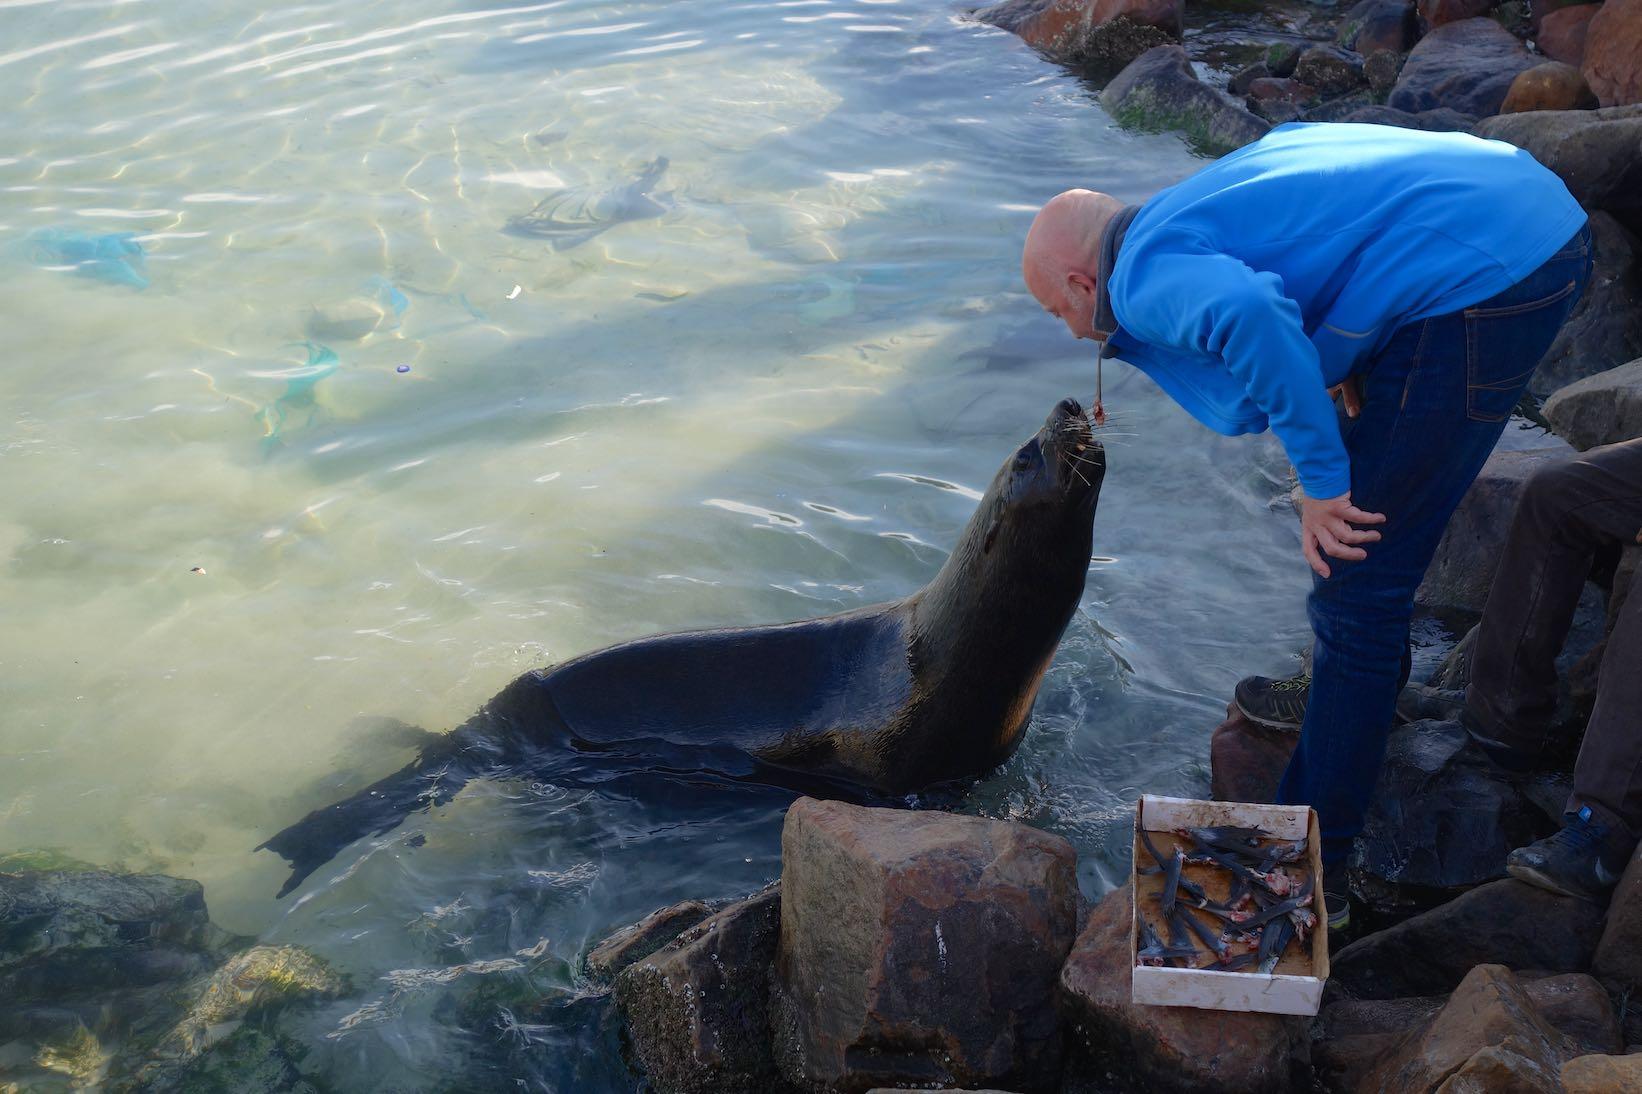 Seehundfütterung in Kapstadt